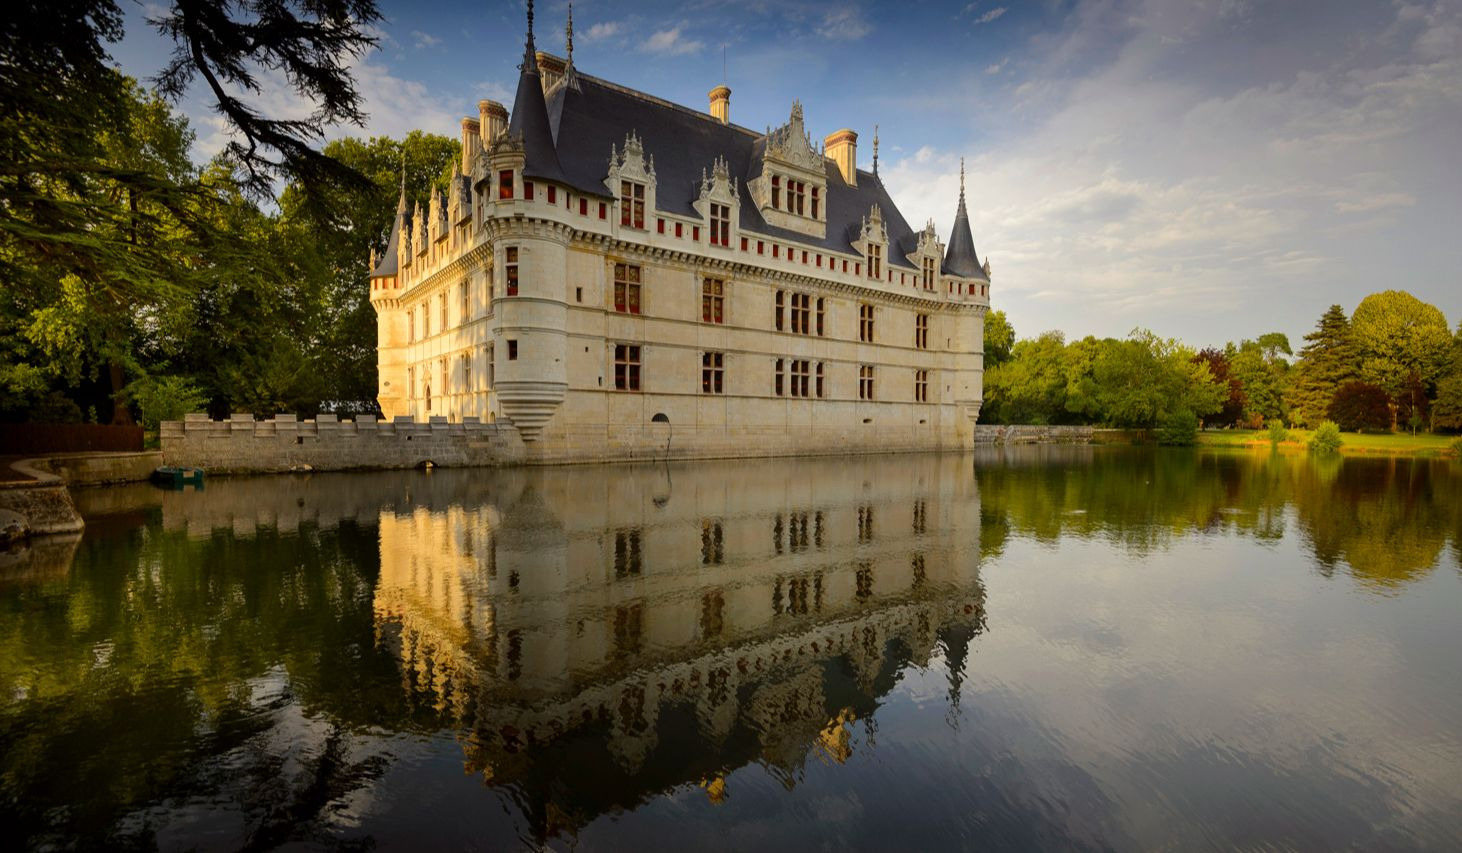 Azay-le-Rideau, la perle romantique du val de Loire. (Photo Leonard de Serres)